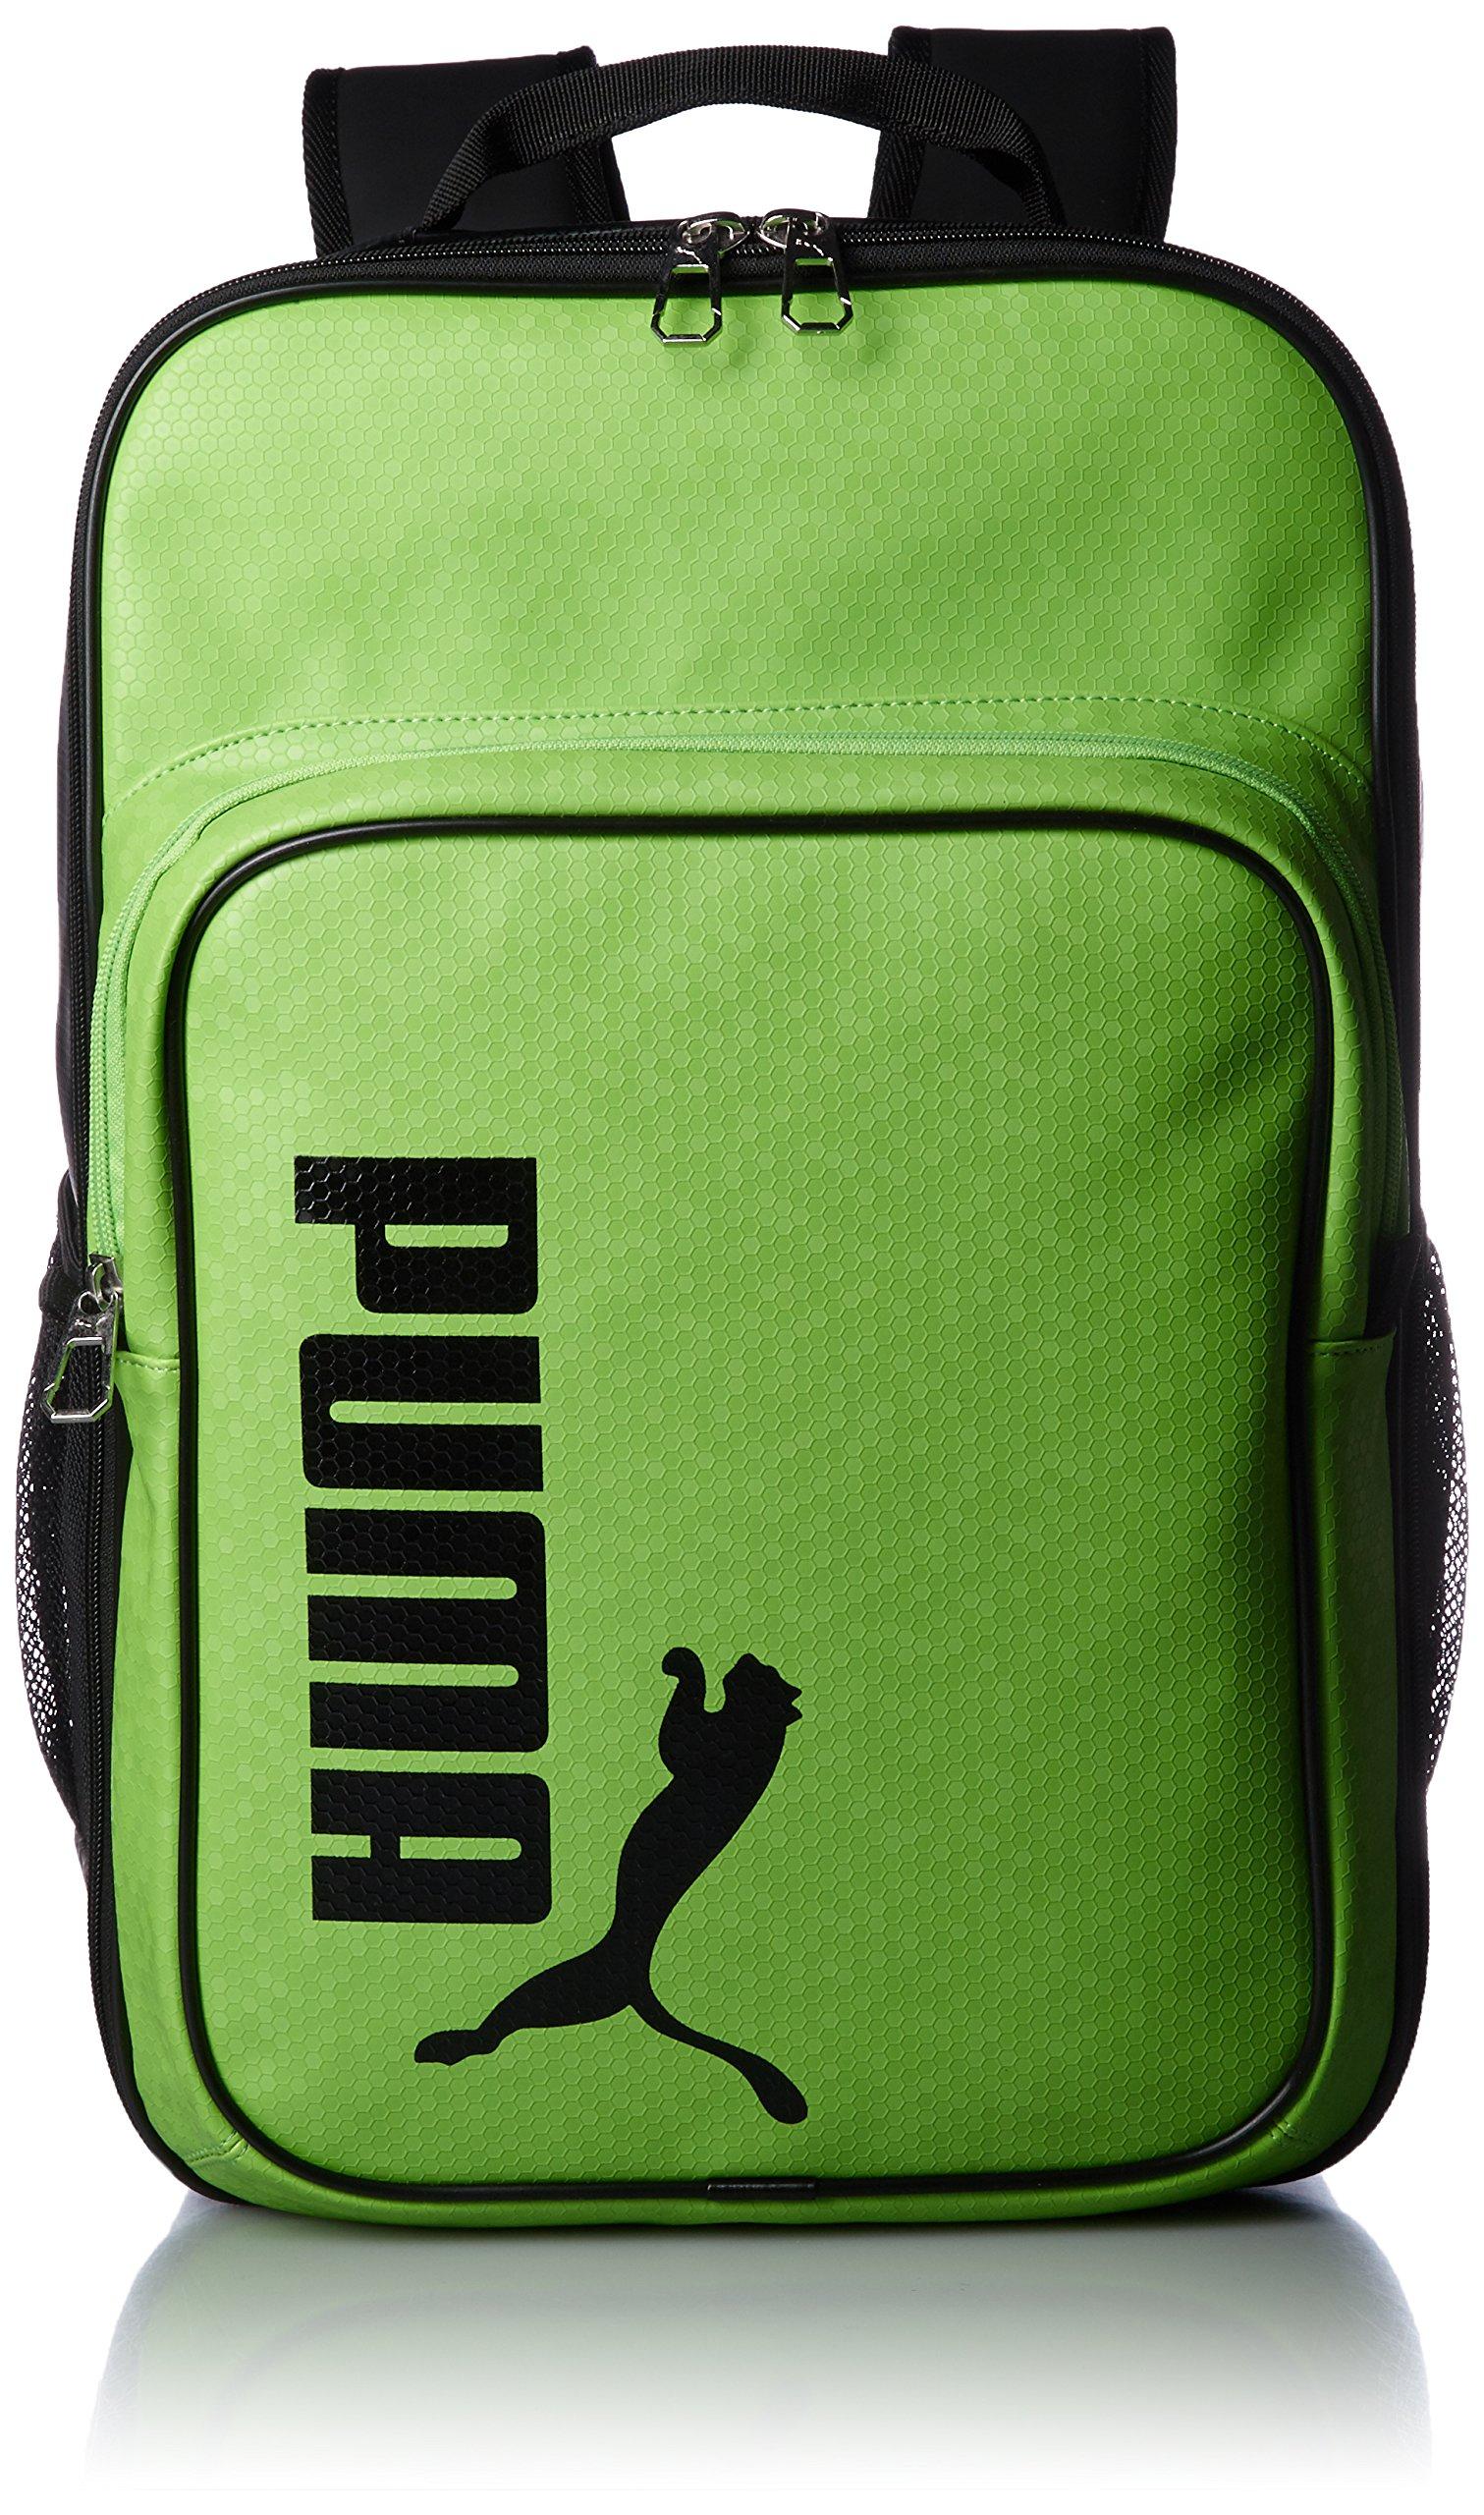 Puma Backpack Enamel Mat Backpack 74666 (Green Gecco/Black)